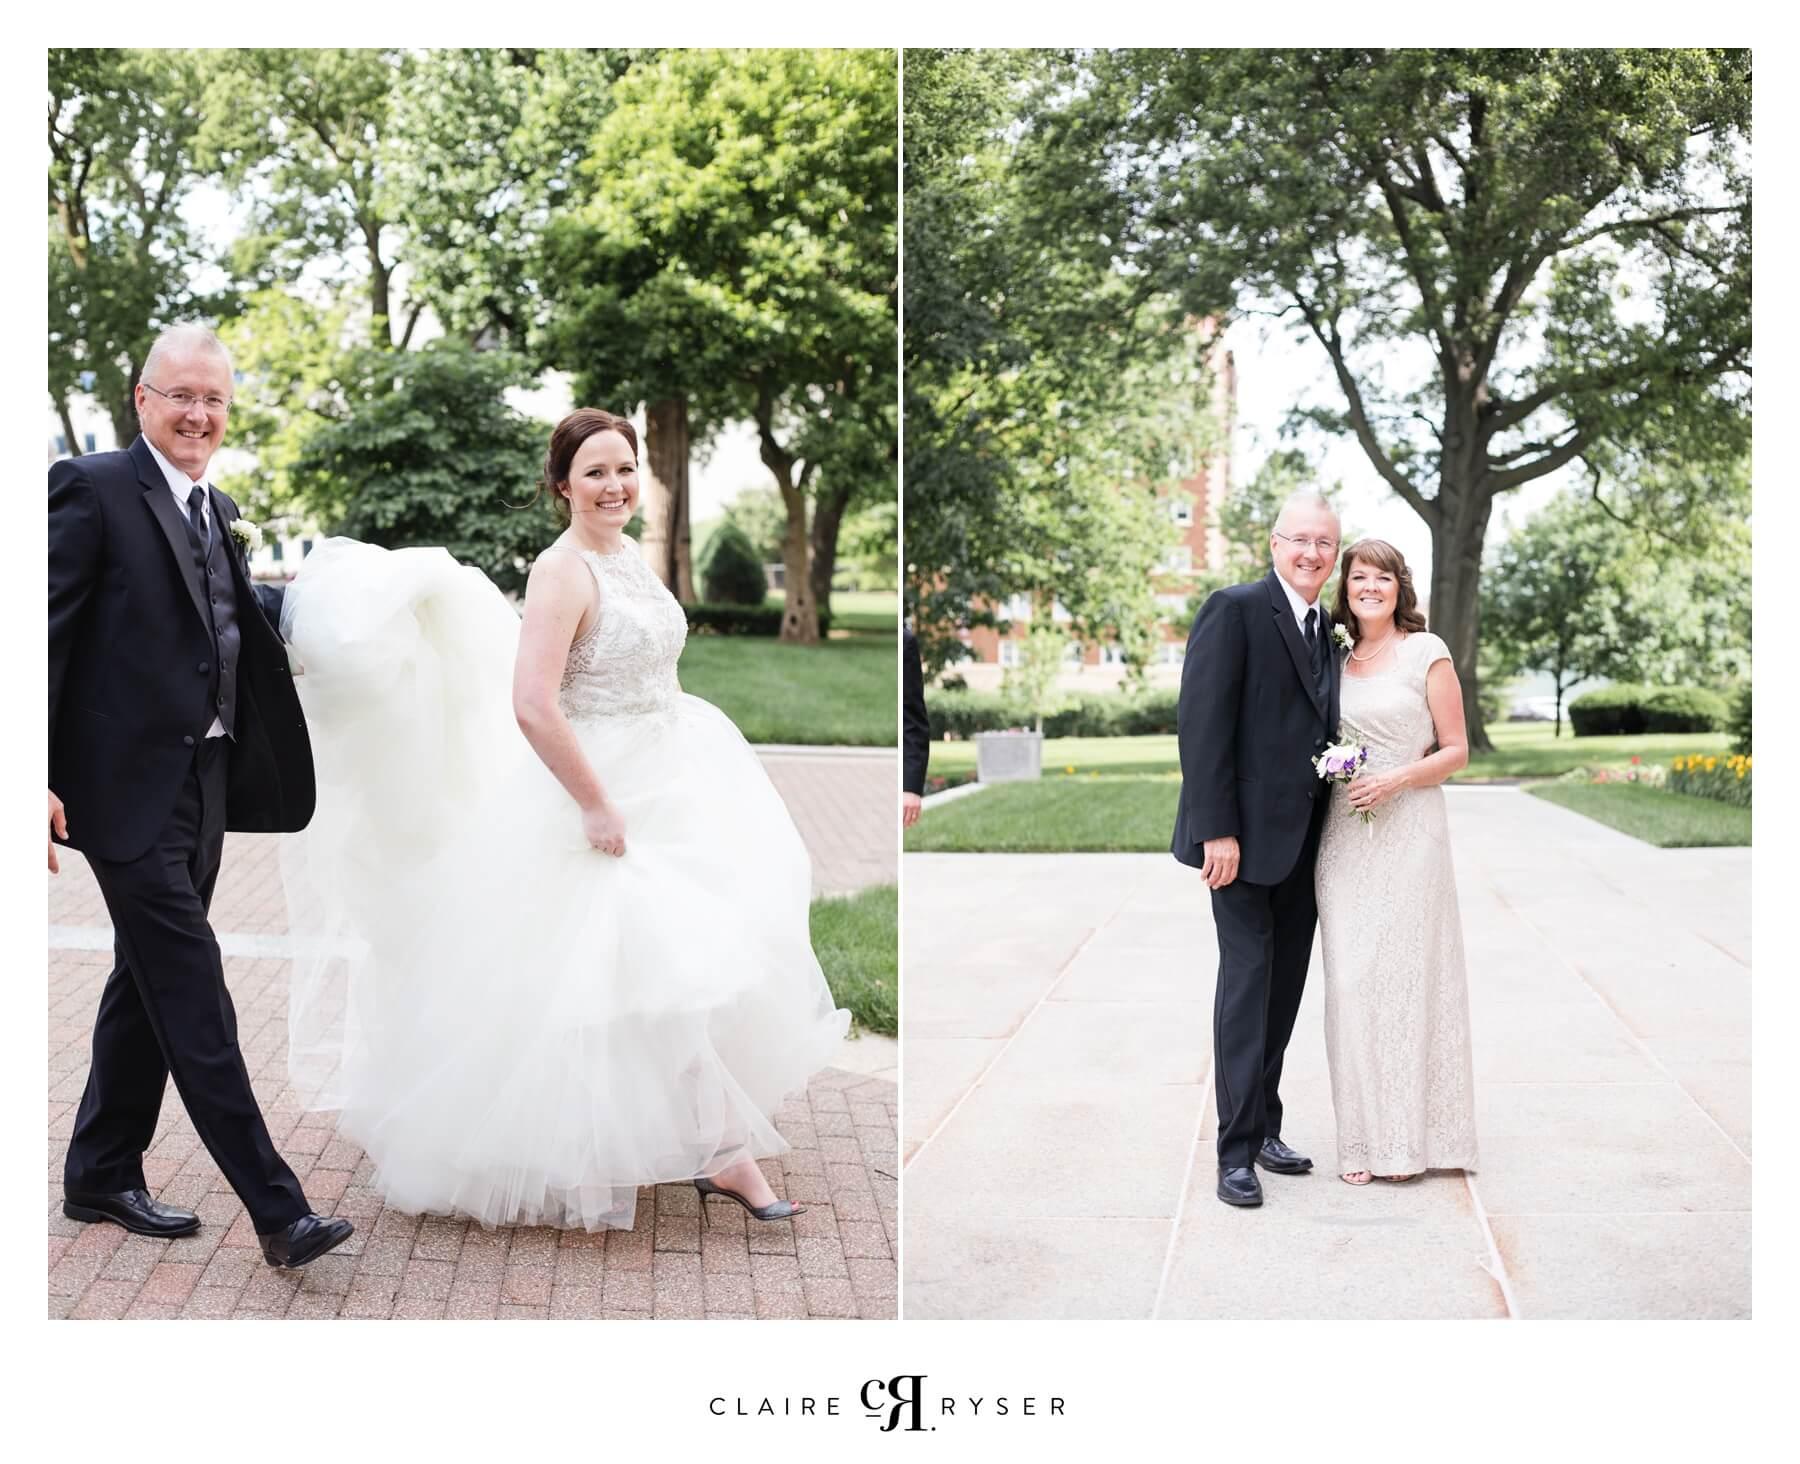 Claire and David Wedding Blog 11.jpg